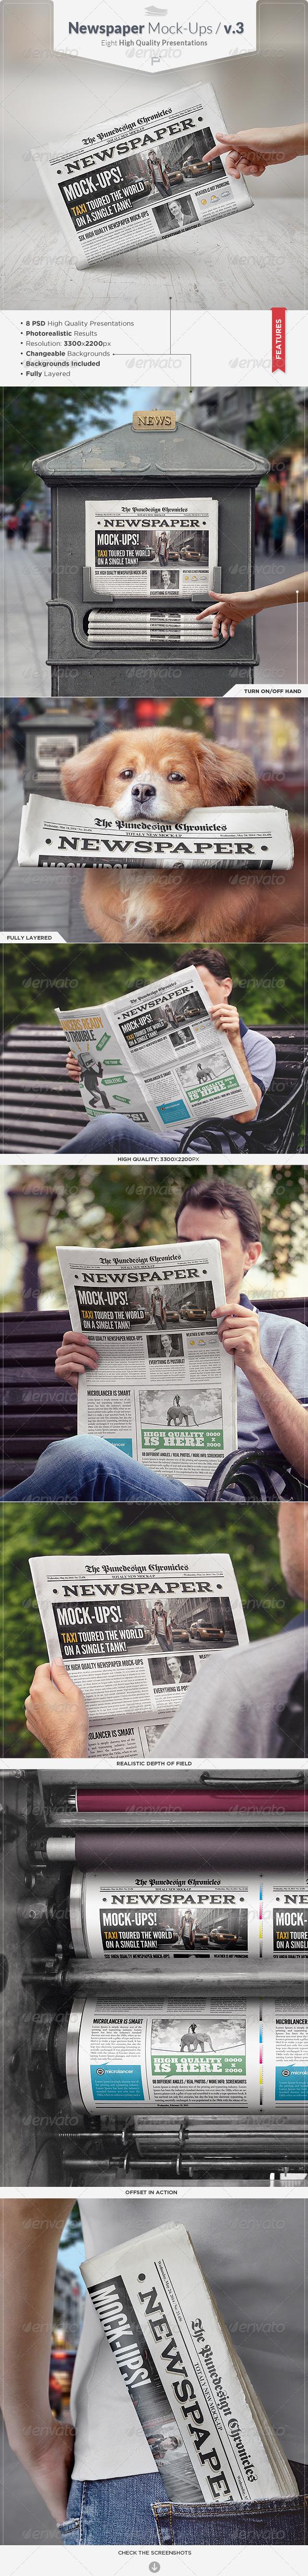 GraphicRiver Newspaper Mock-Ups v.3 7897076